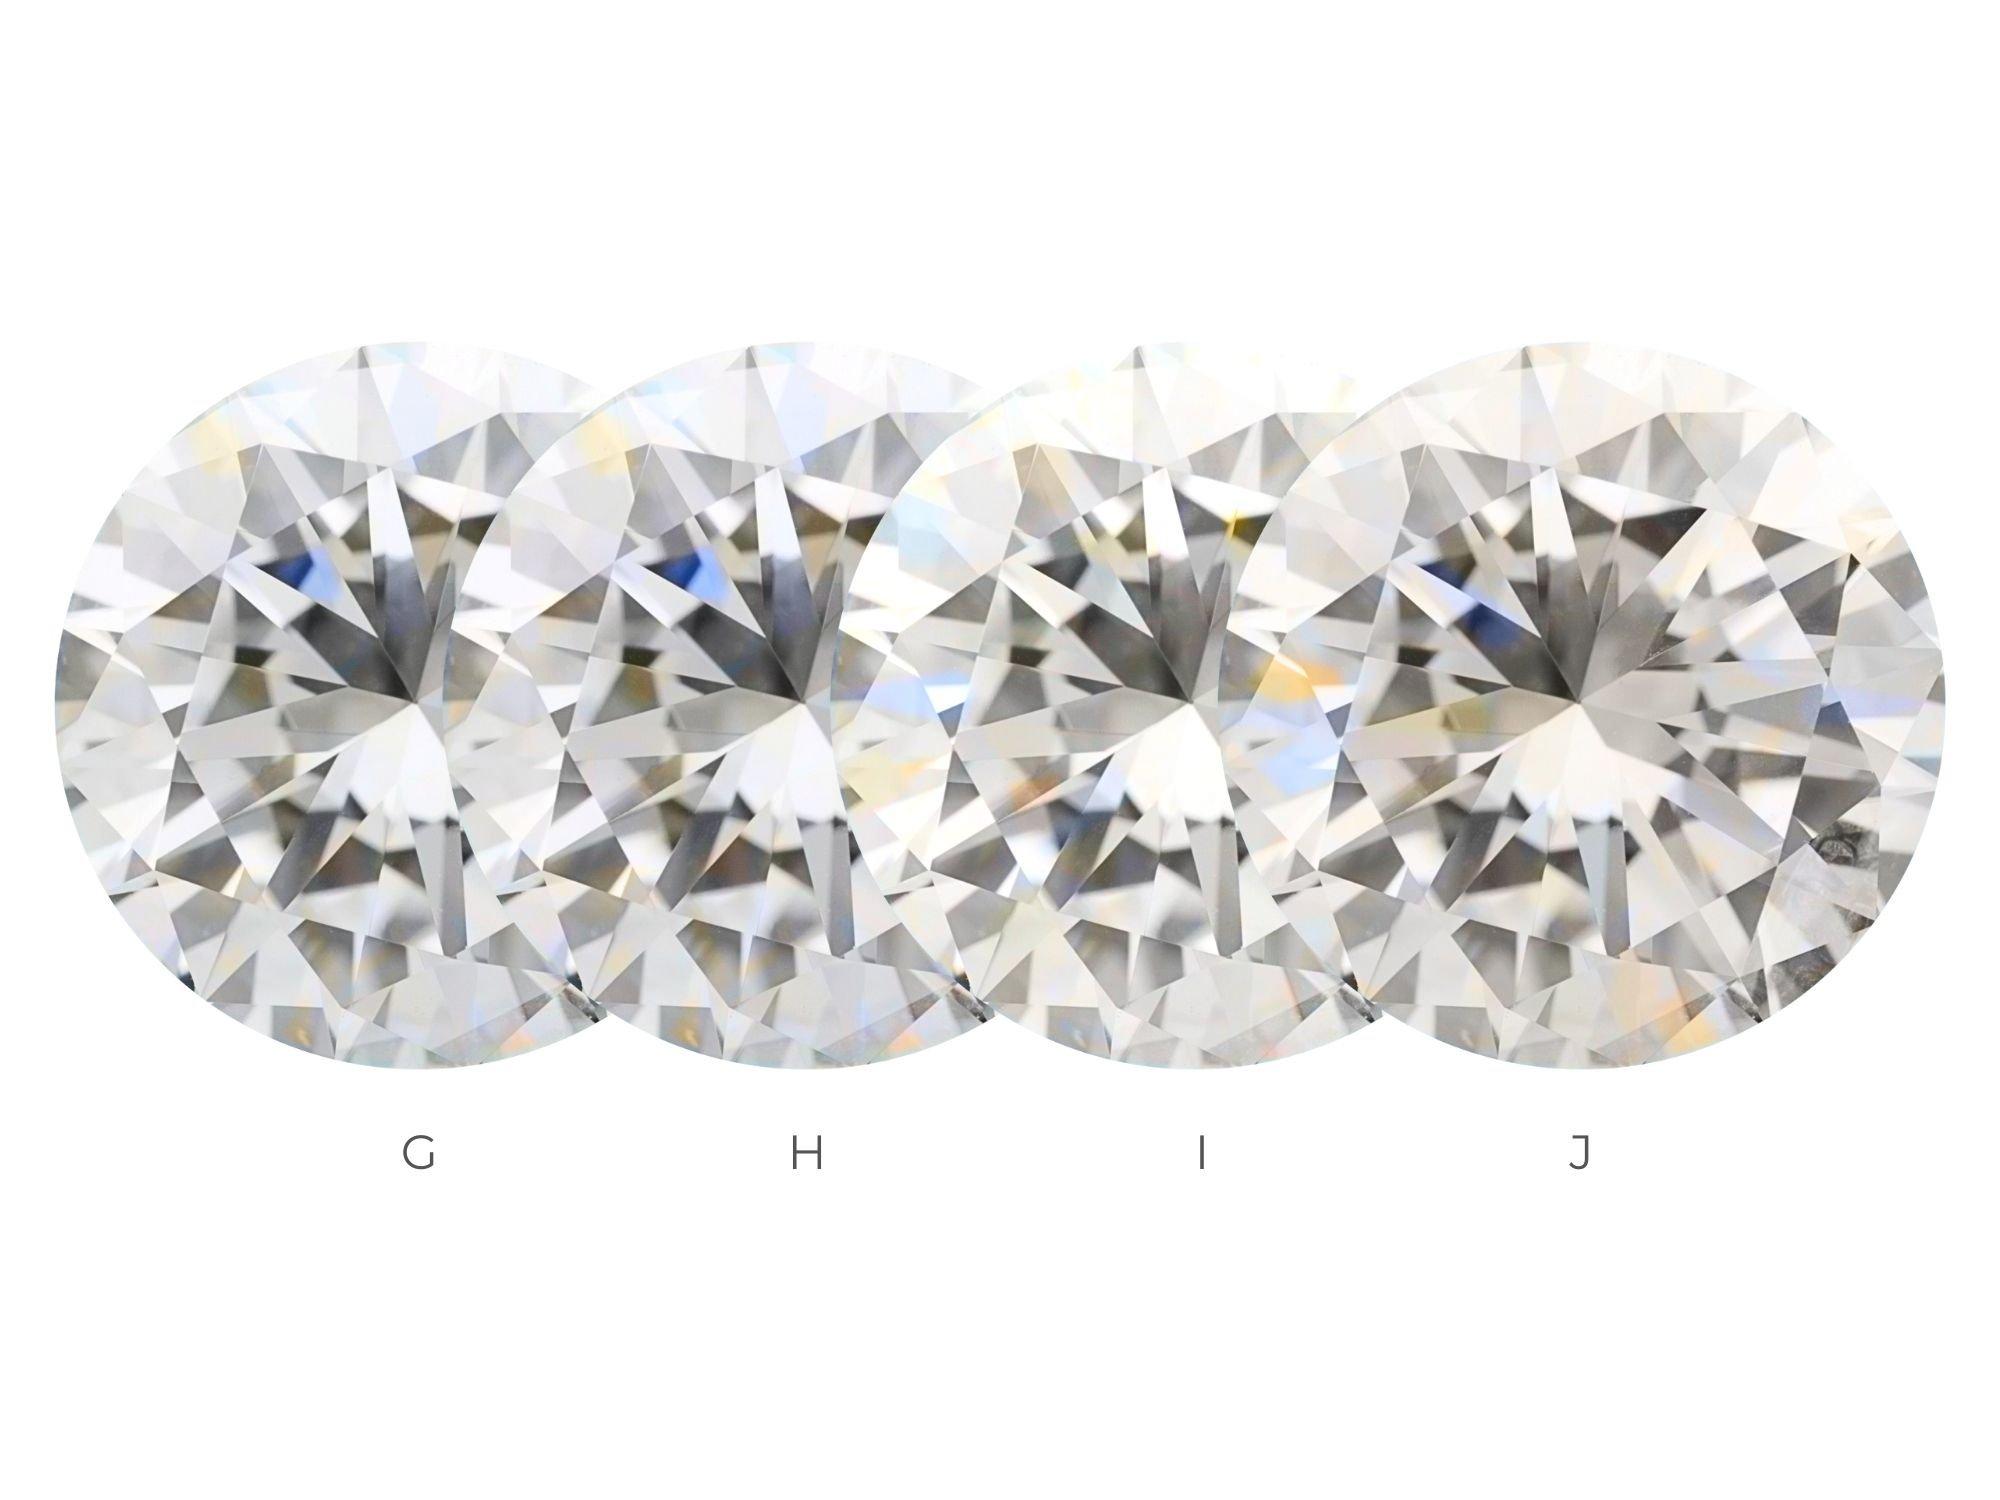 G, H, I, J Colour Diamond Comparison | Diamond Buzz